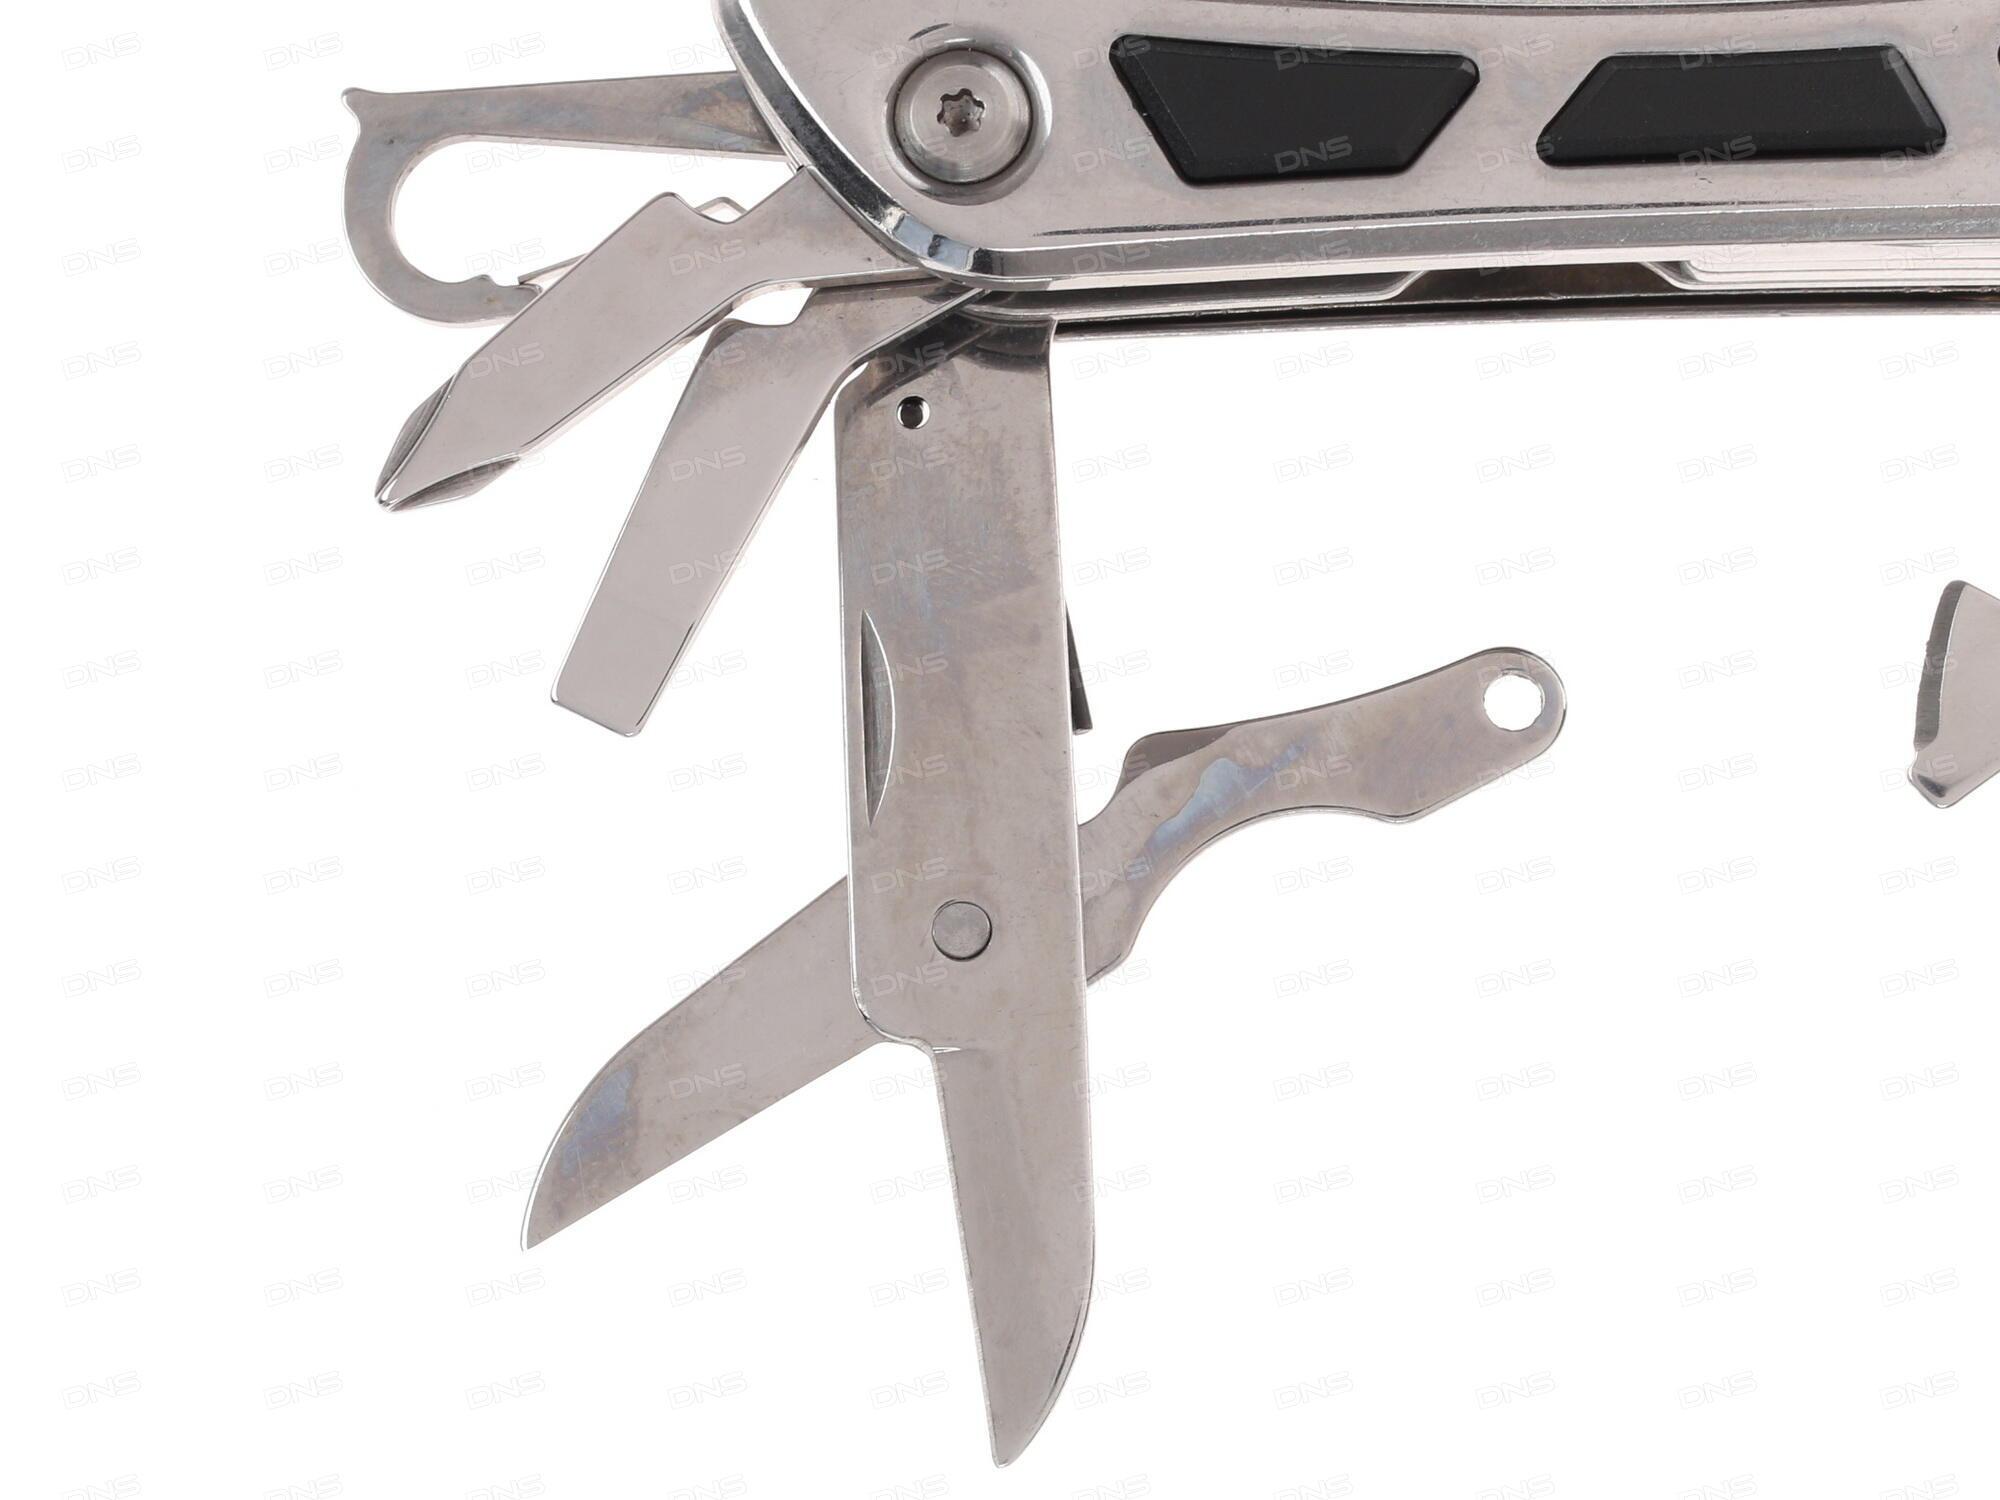 Нож Зубр Премиум Диверсант - длина лезвия 120мм 47717